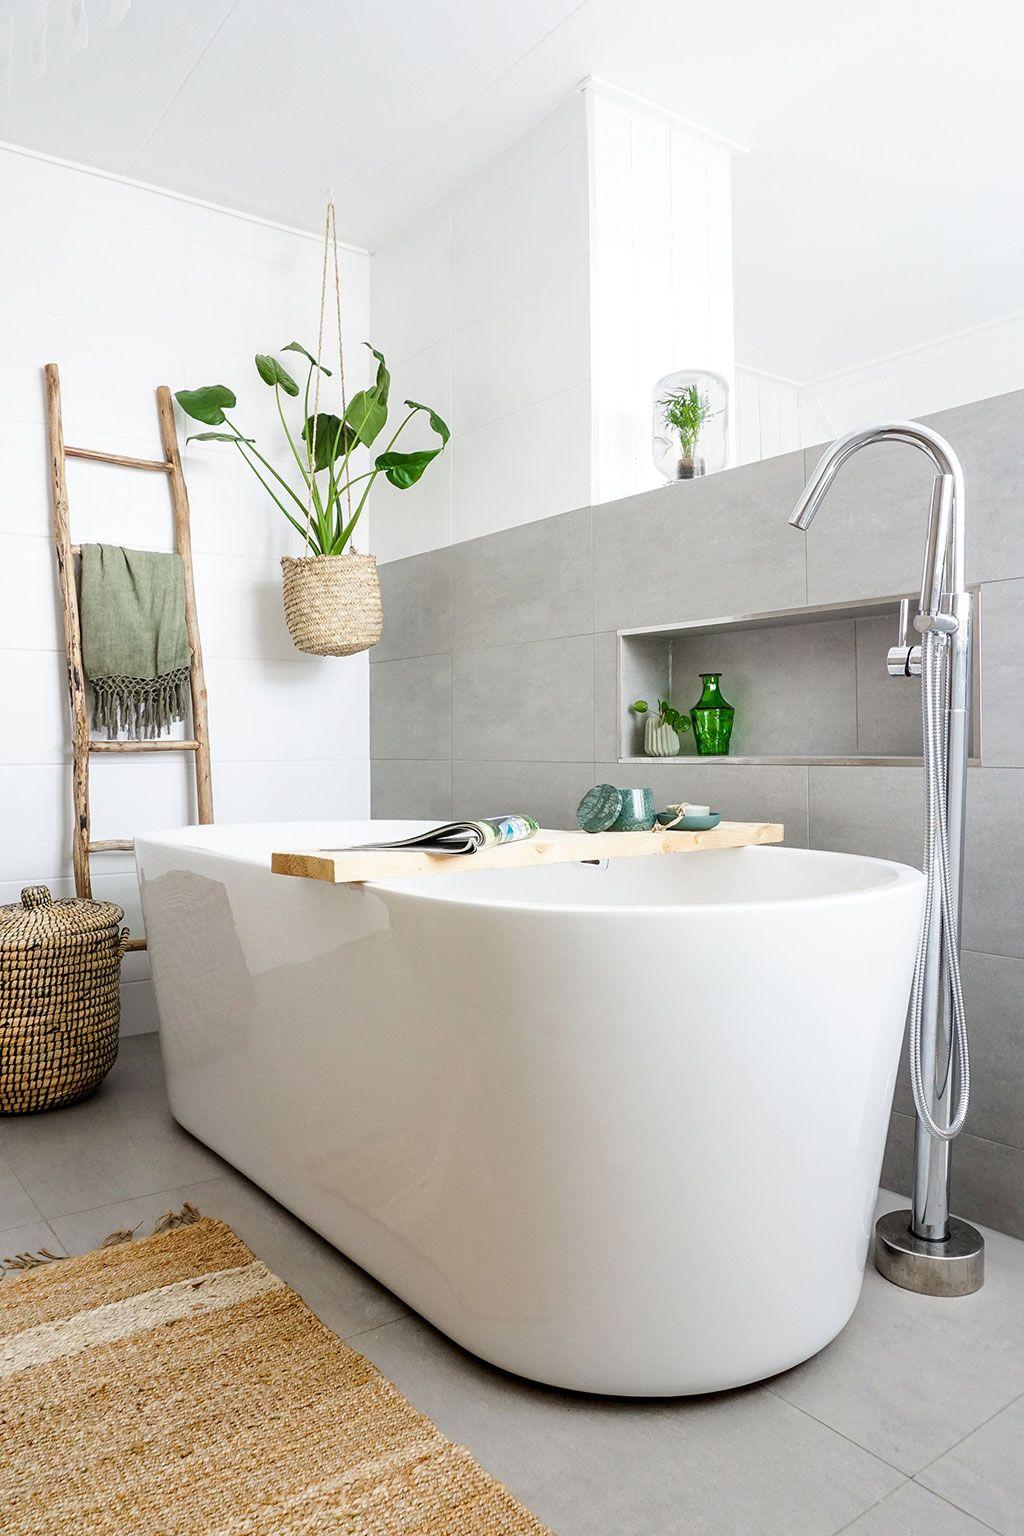 3x Splashing badkamer - Badkamer, Kleur en Badkamer inspiratie